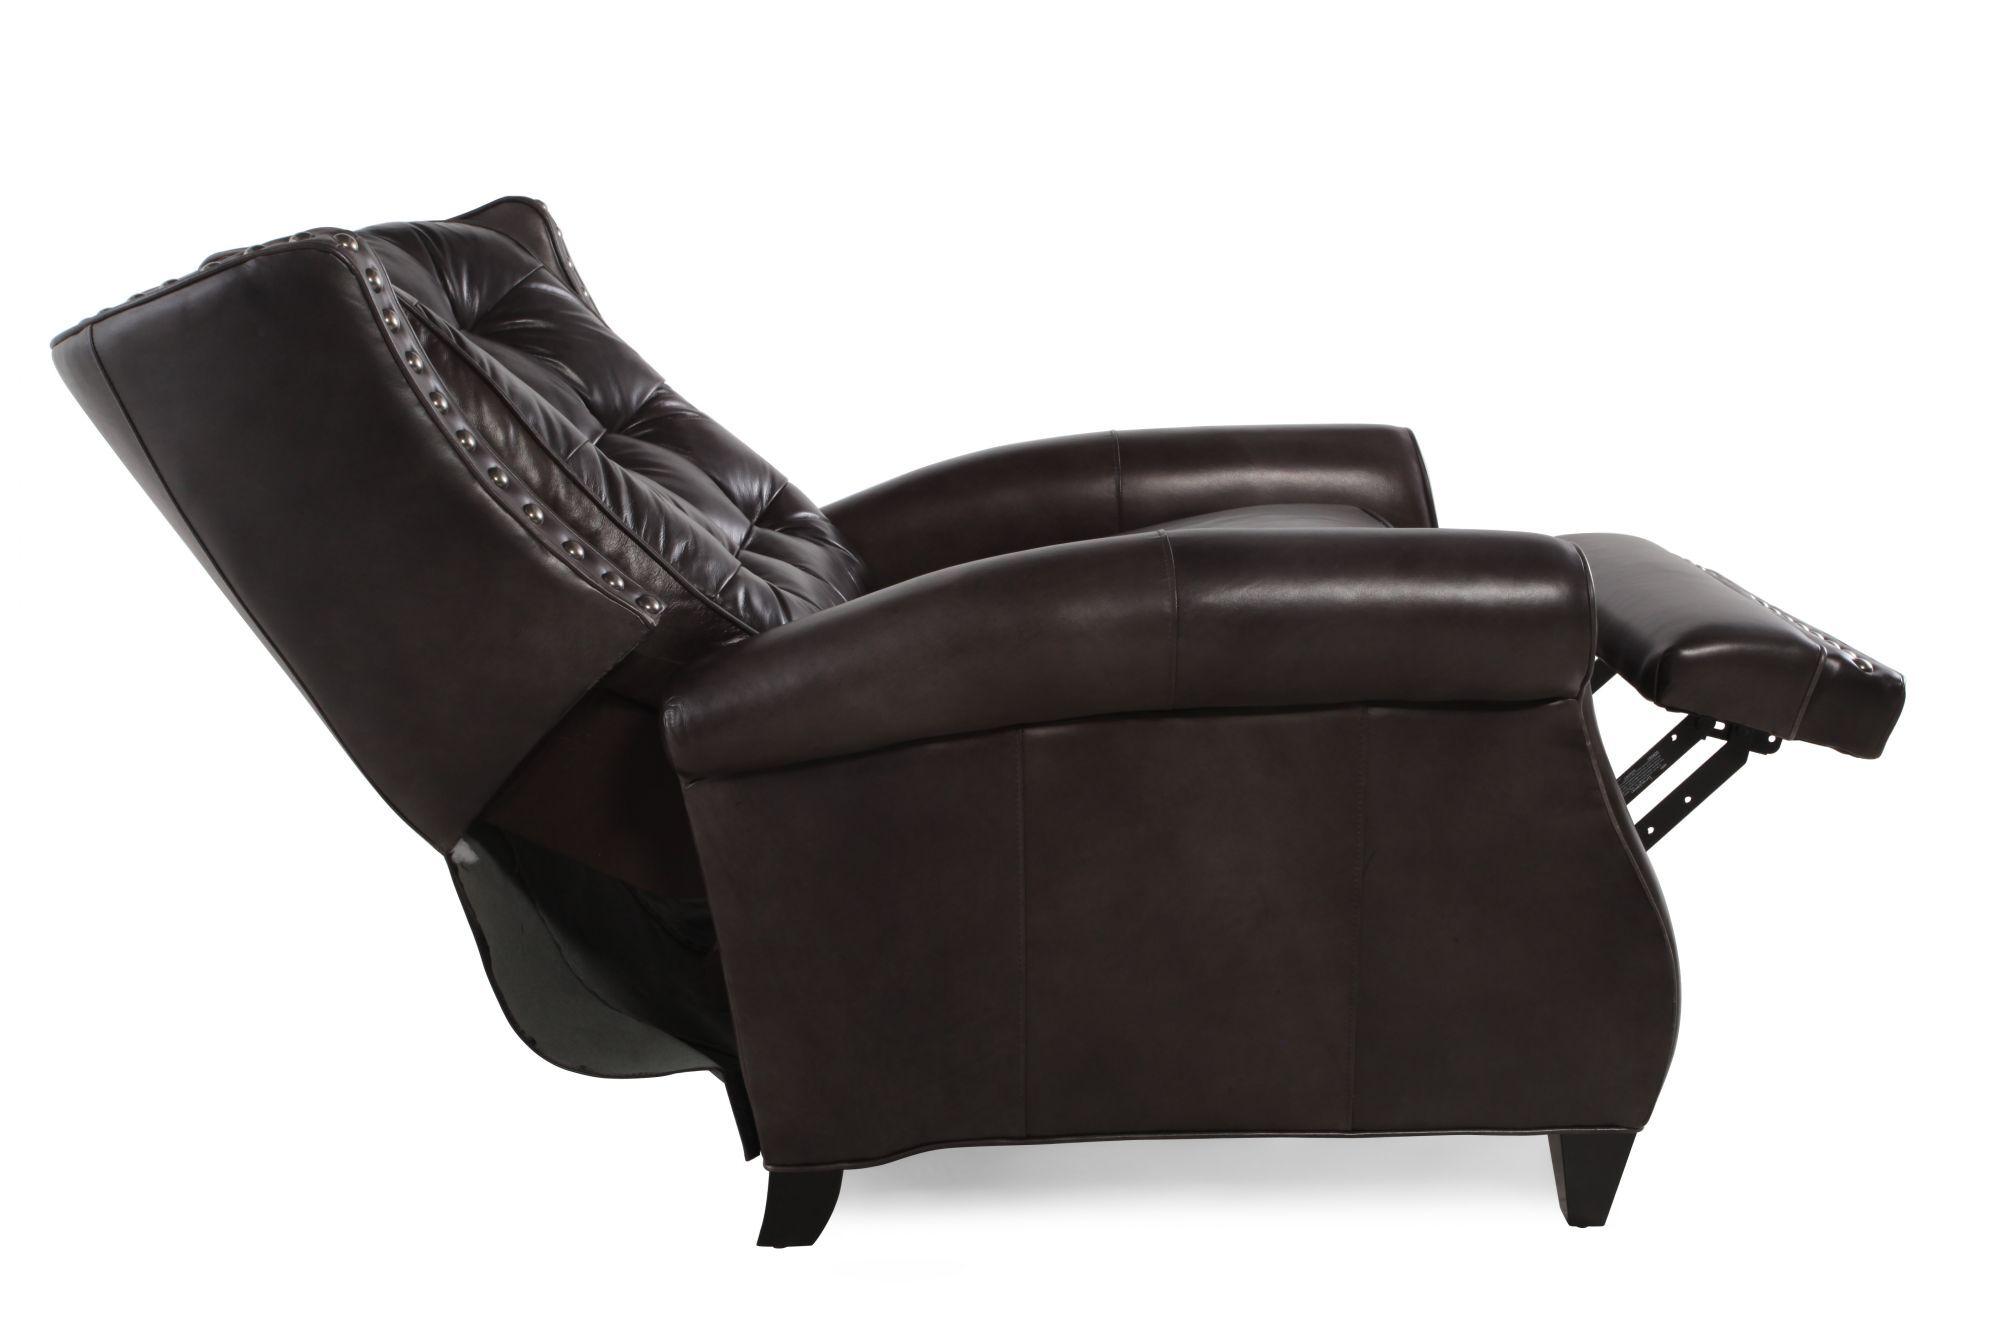 Bernhardt Leather Pierce Recliner  sc 1 st  Mathis Brothers & Bernhardt Leather Pierce Recliner | Mathis Brothers Furniture islam-shia.org